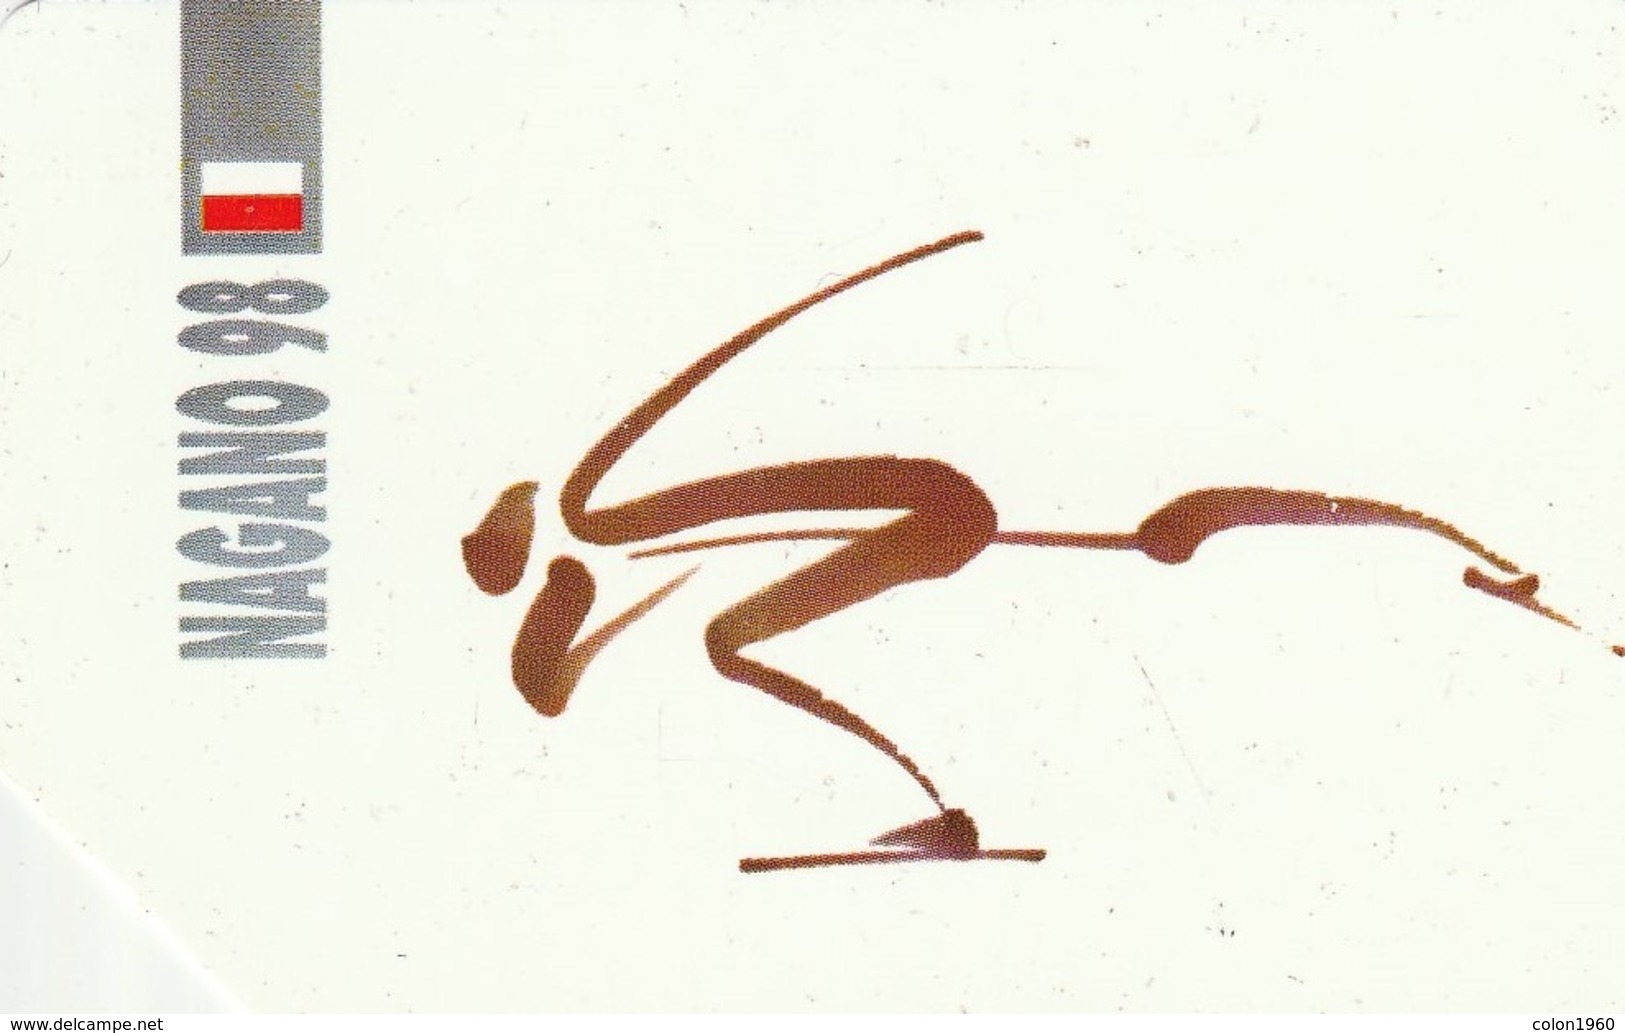 POLONIA. Juegos Olimpicos. Nagano 98. Speed Skating. 452. (061) - Jeux Olympiques